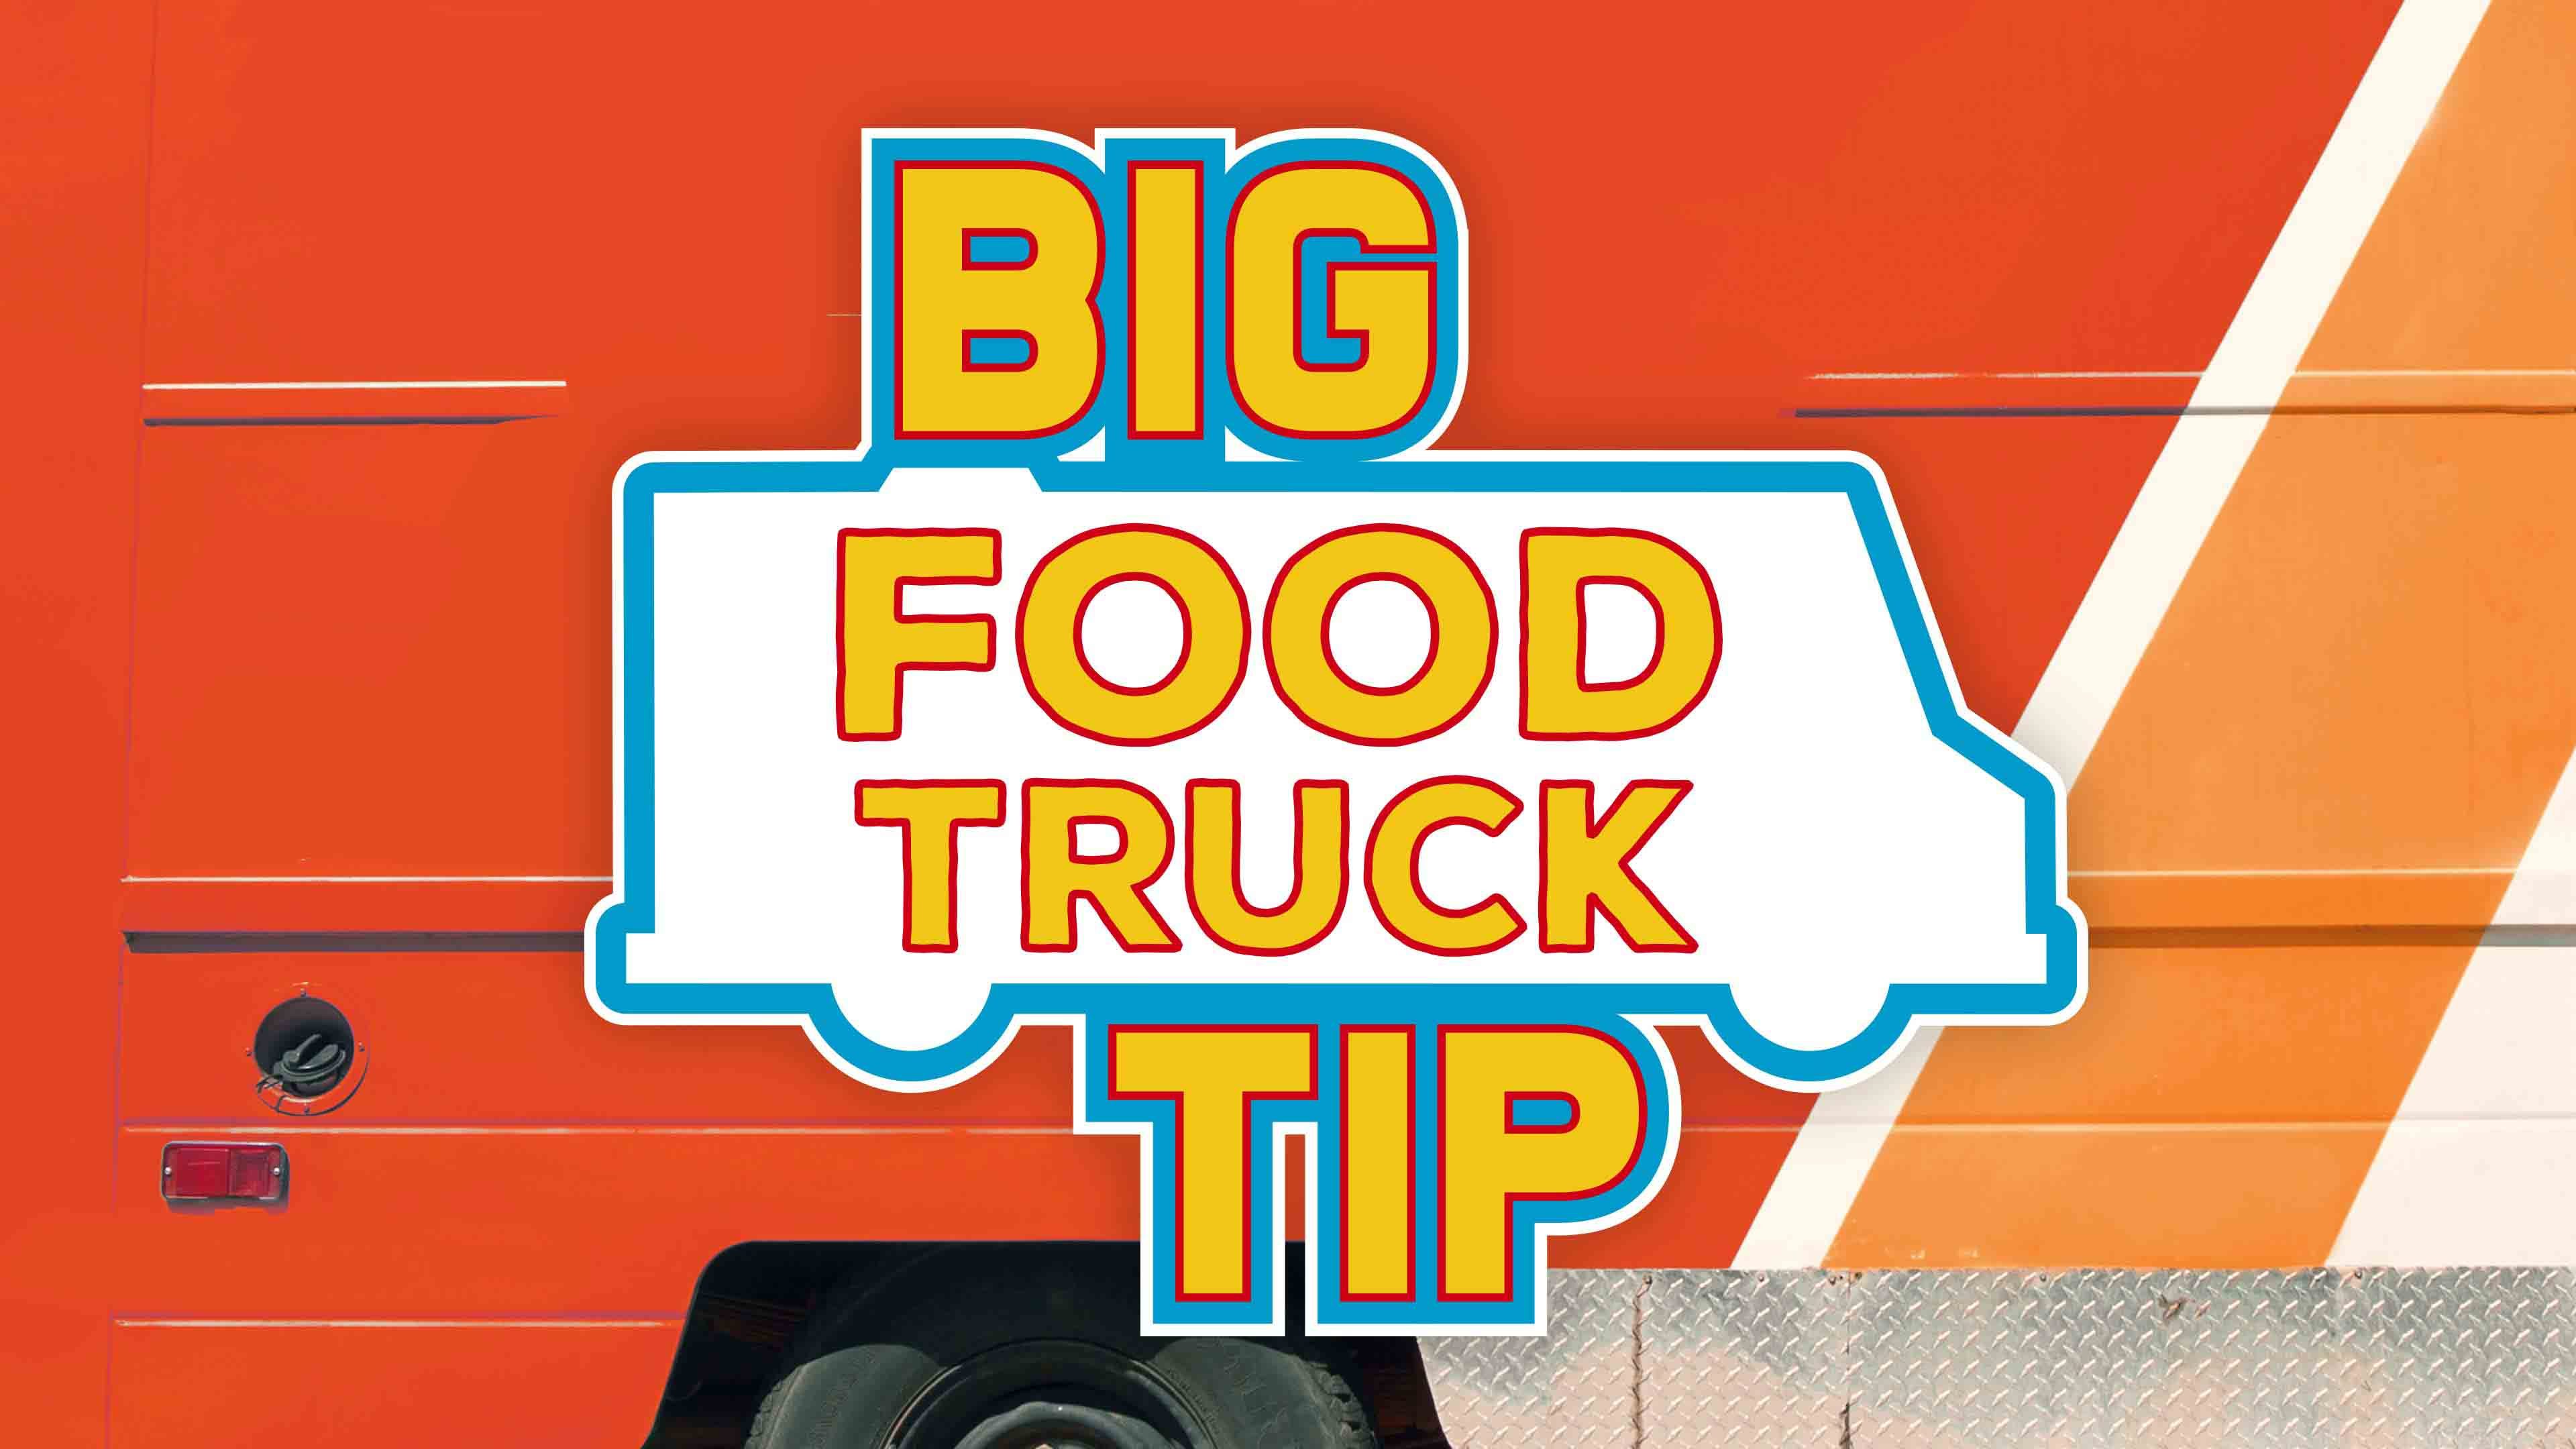 Big Food Truck Tip | Big Food Truck Tip | Food Network